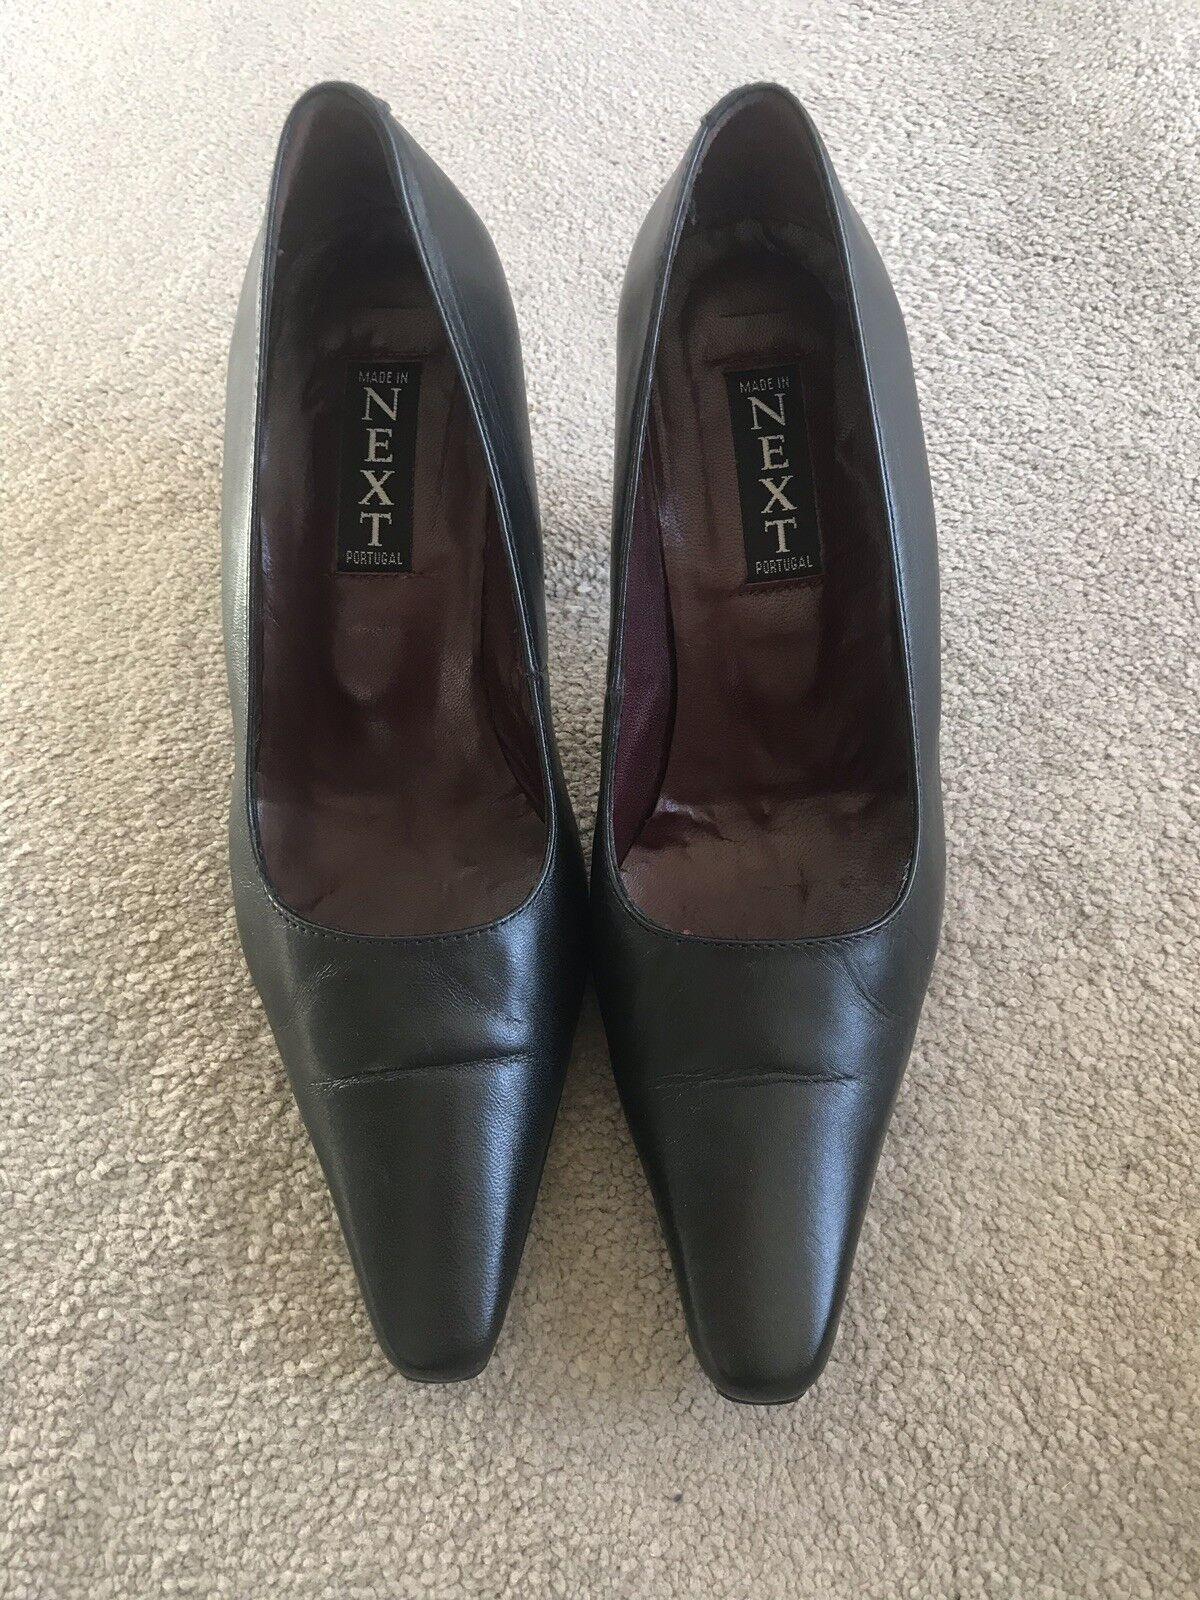 Women's Next Black Leather Court shoes Size 36.5   3.5